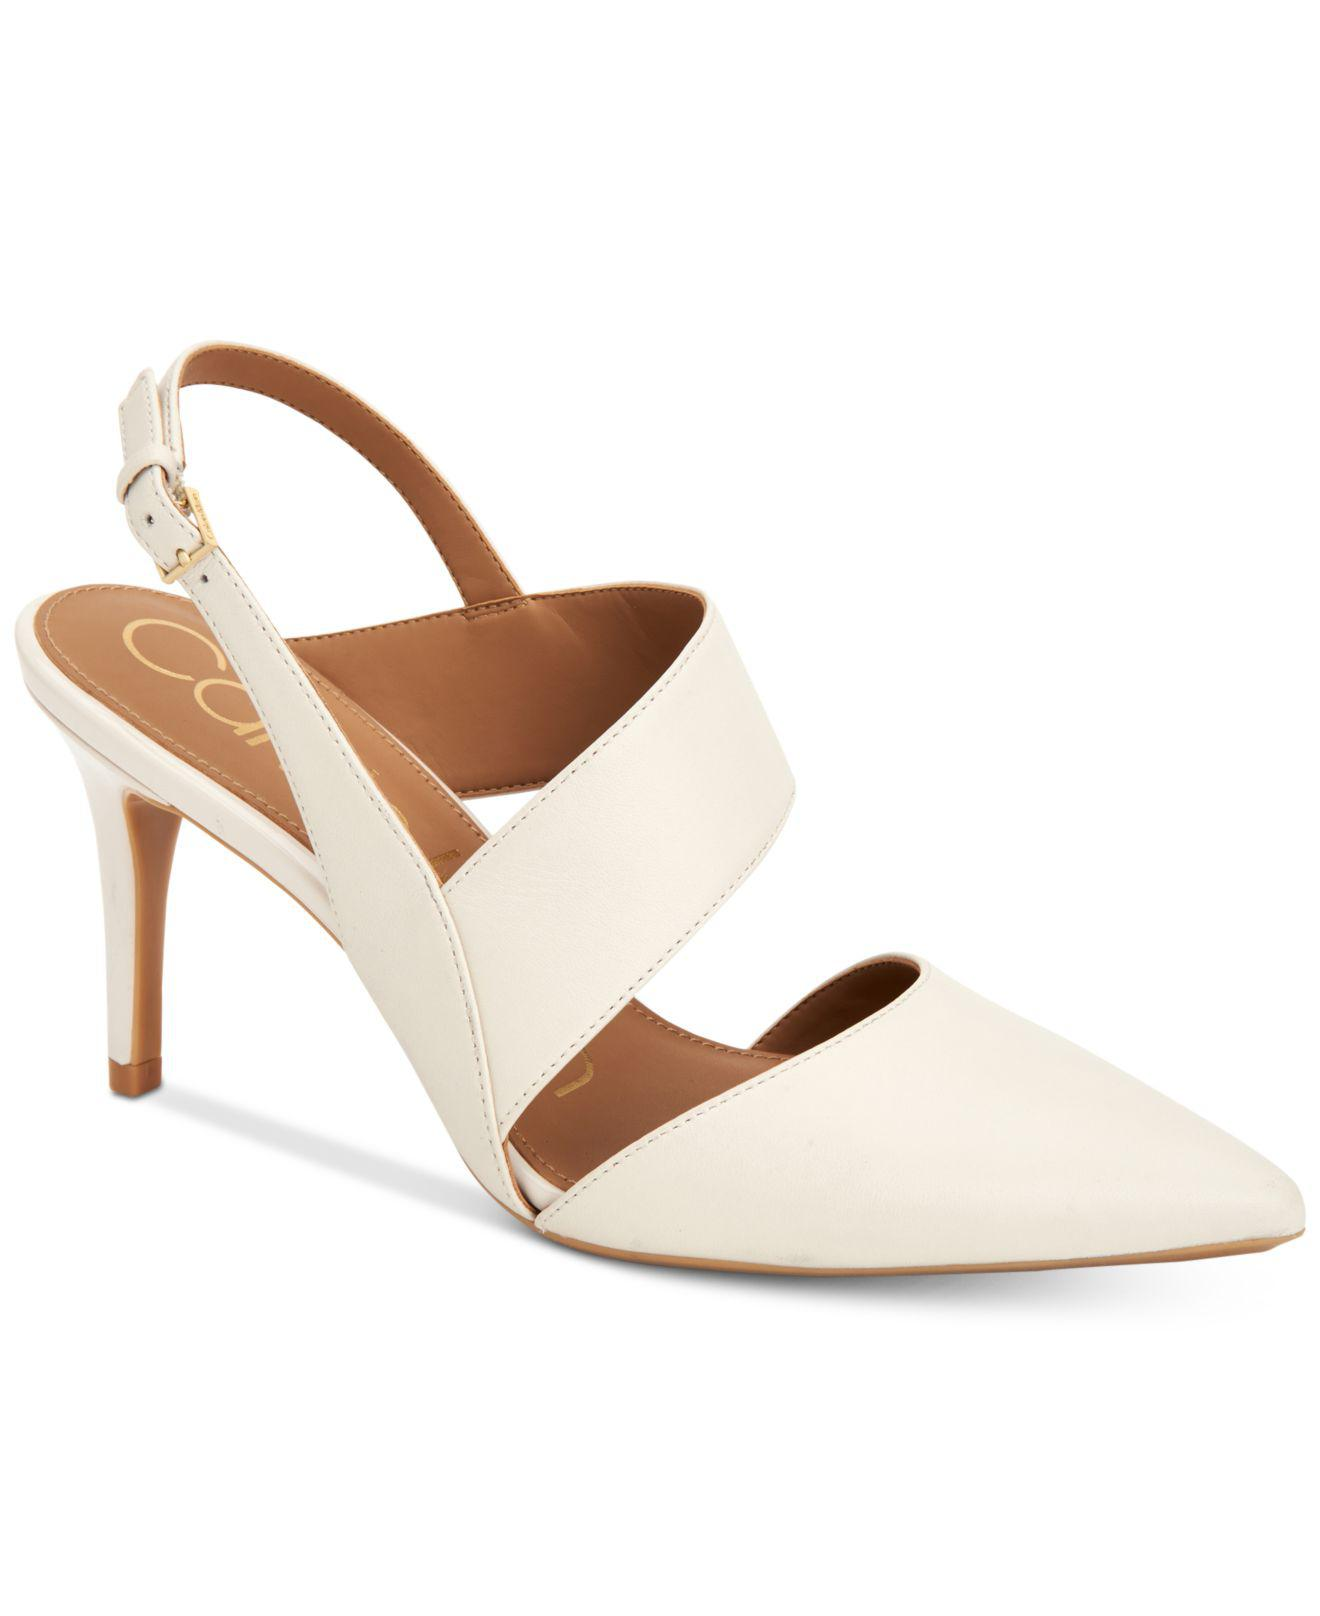 aab74491413 Calvin Klein Womens Gianna Leather Pointed Toe SlingBack